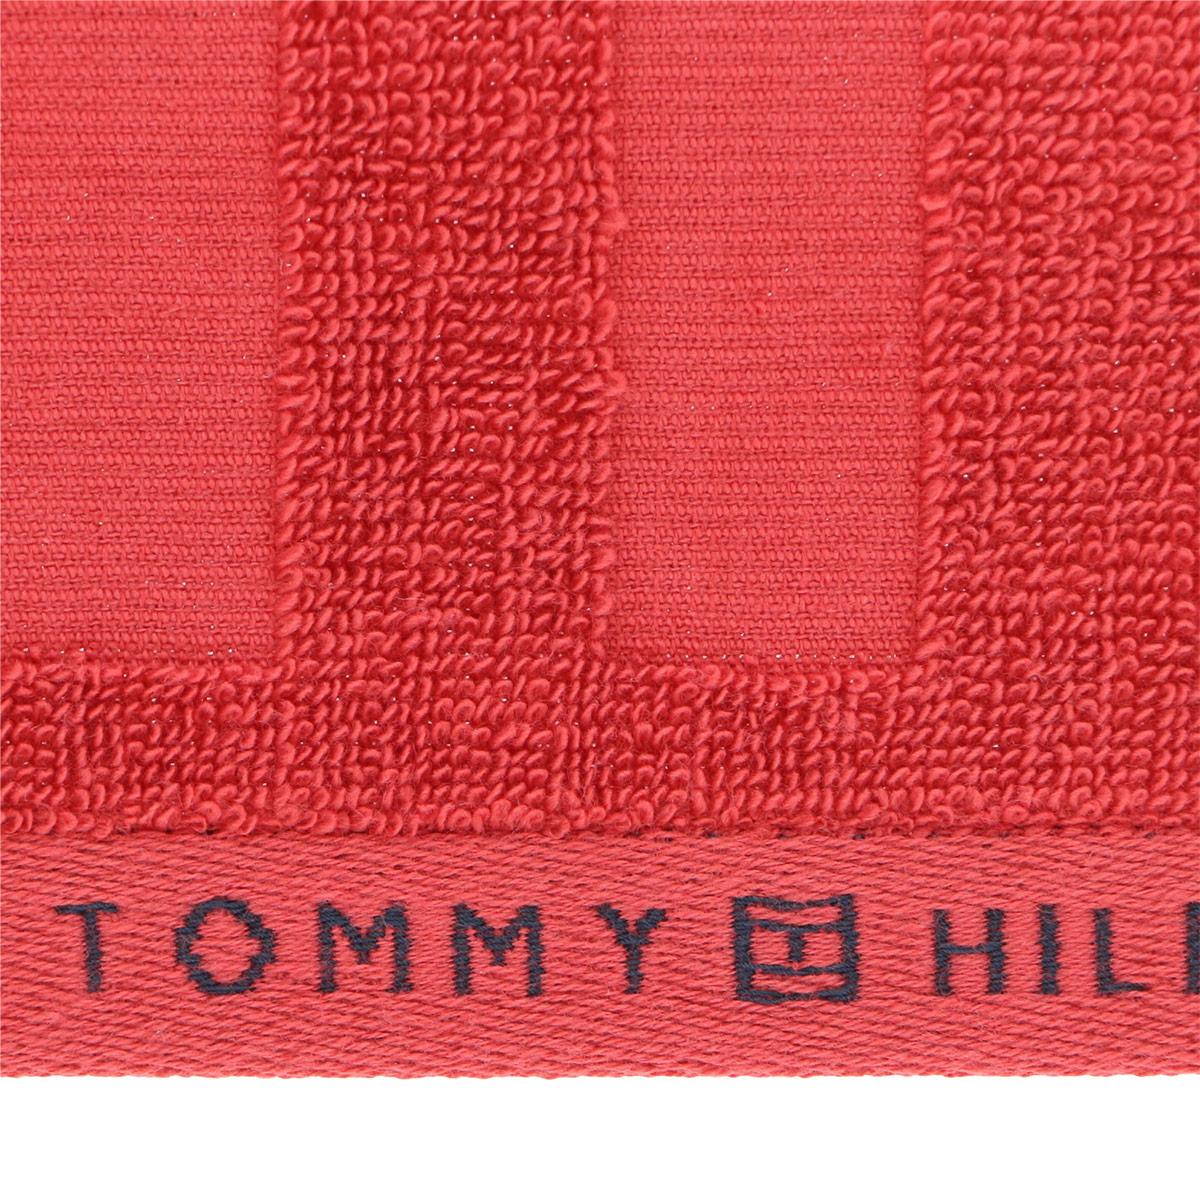 TOMMY HILFIGER トミーヒルフィガー ブランド ラッピングOK ロゴ タオル ハンカチ ( ミニタオル ) 男性 メンズ 2582-145 【ゆうパケット・4点まで】